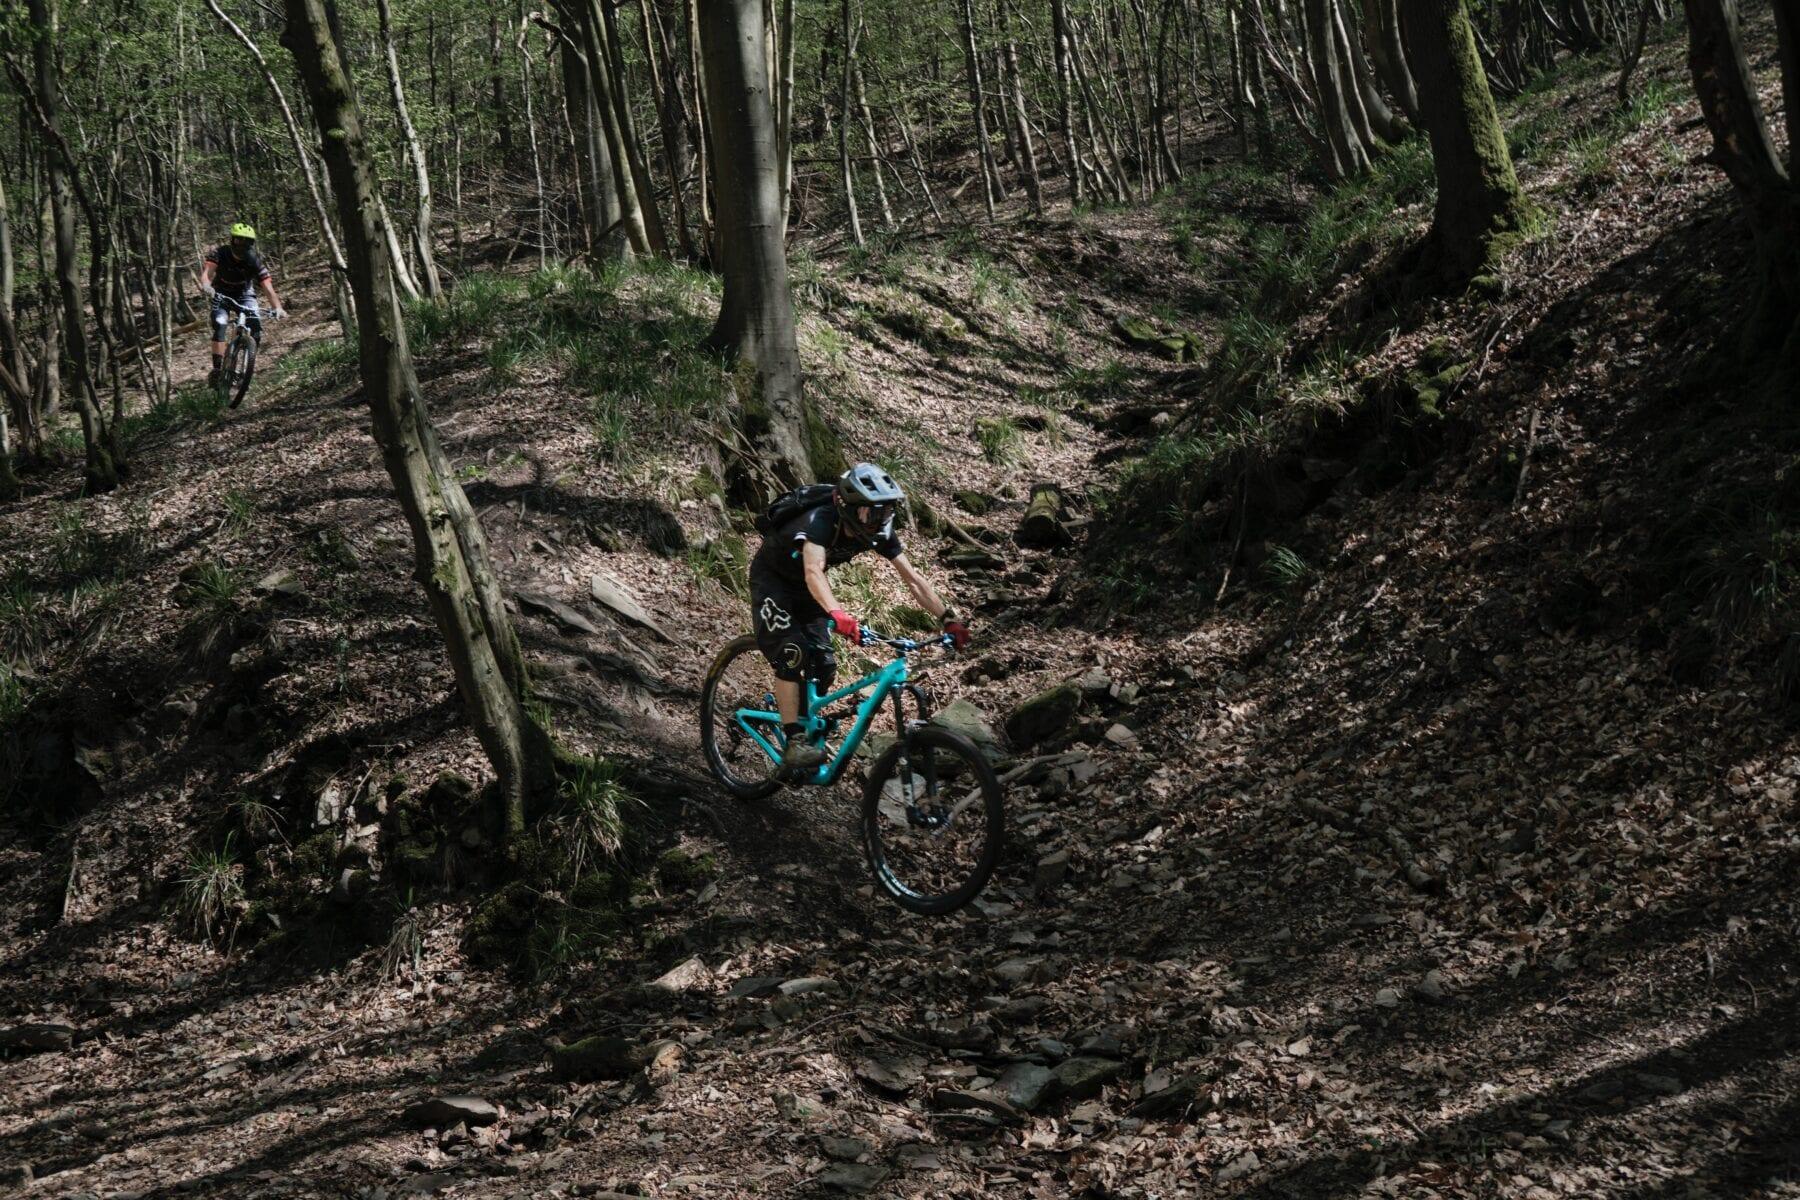 mountainbike mtb-vignet nederland Utrechtse Heuvelrug